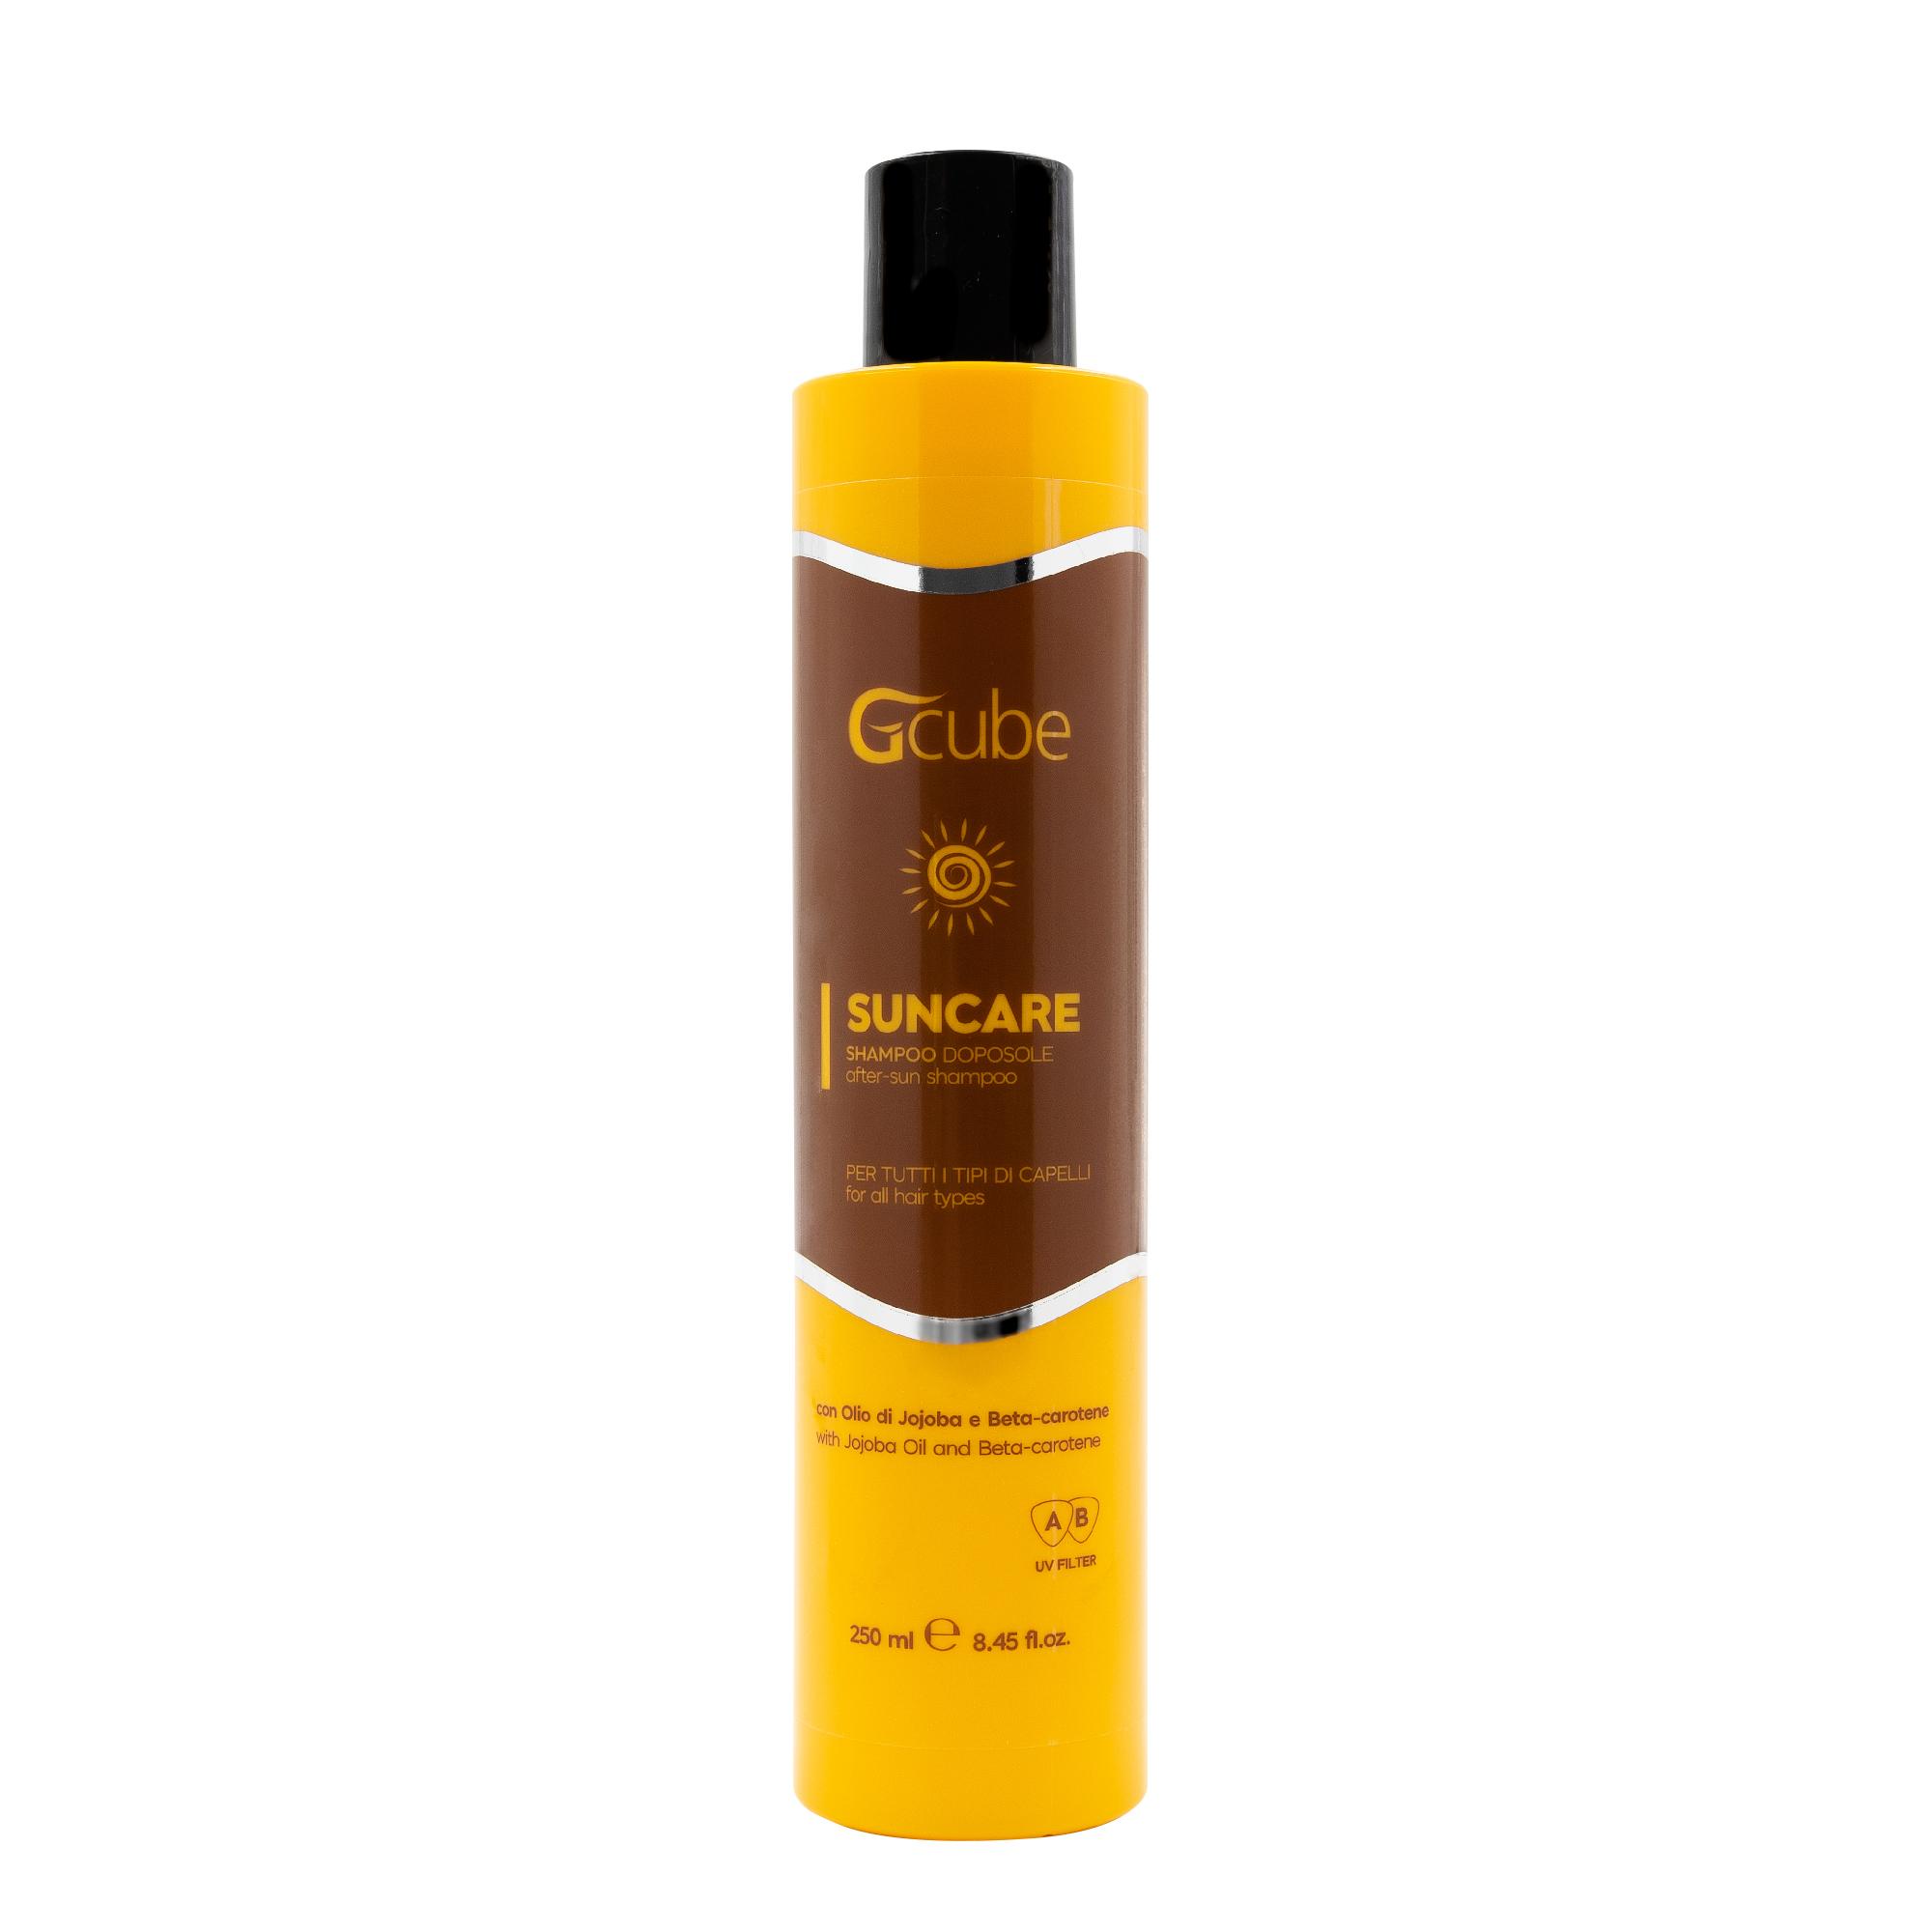 Image of Gcube Suncare - Shampoo Doposole con Olio di Jojoba e Beta-carotene 250 Ml 8054181911732